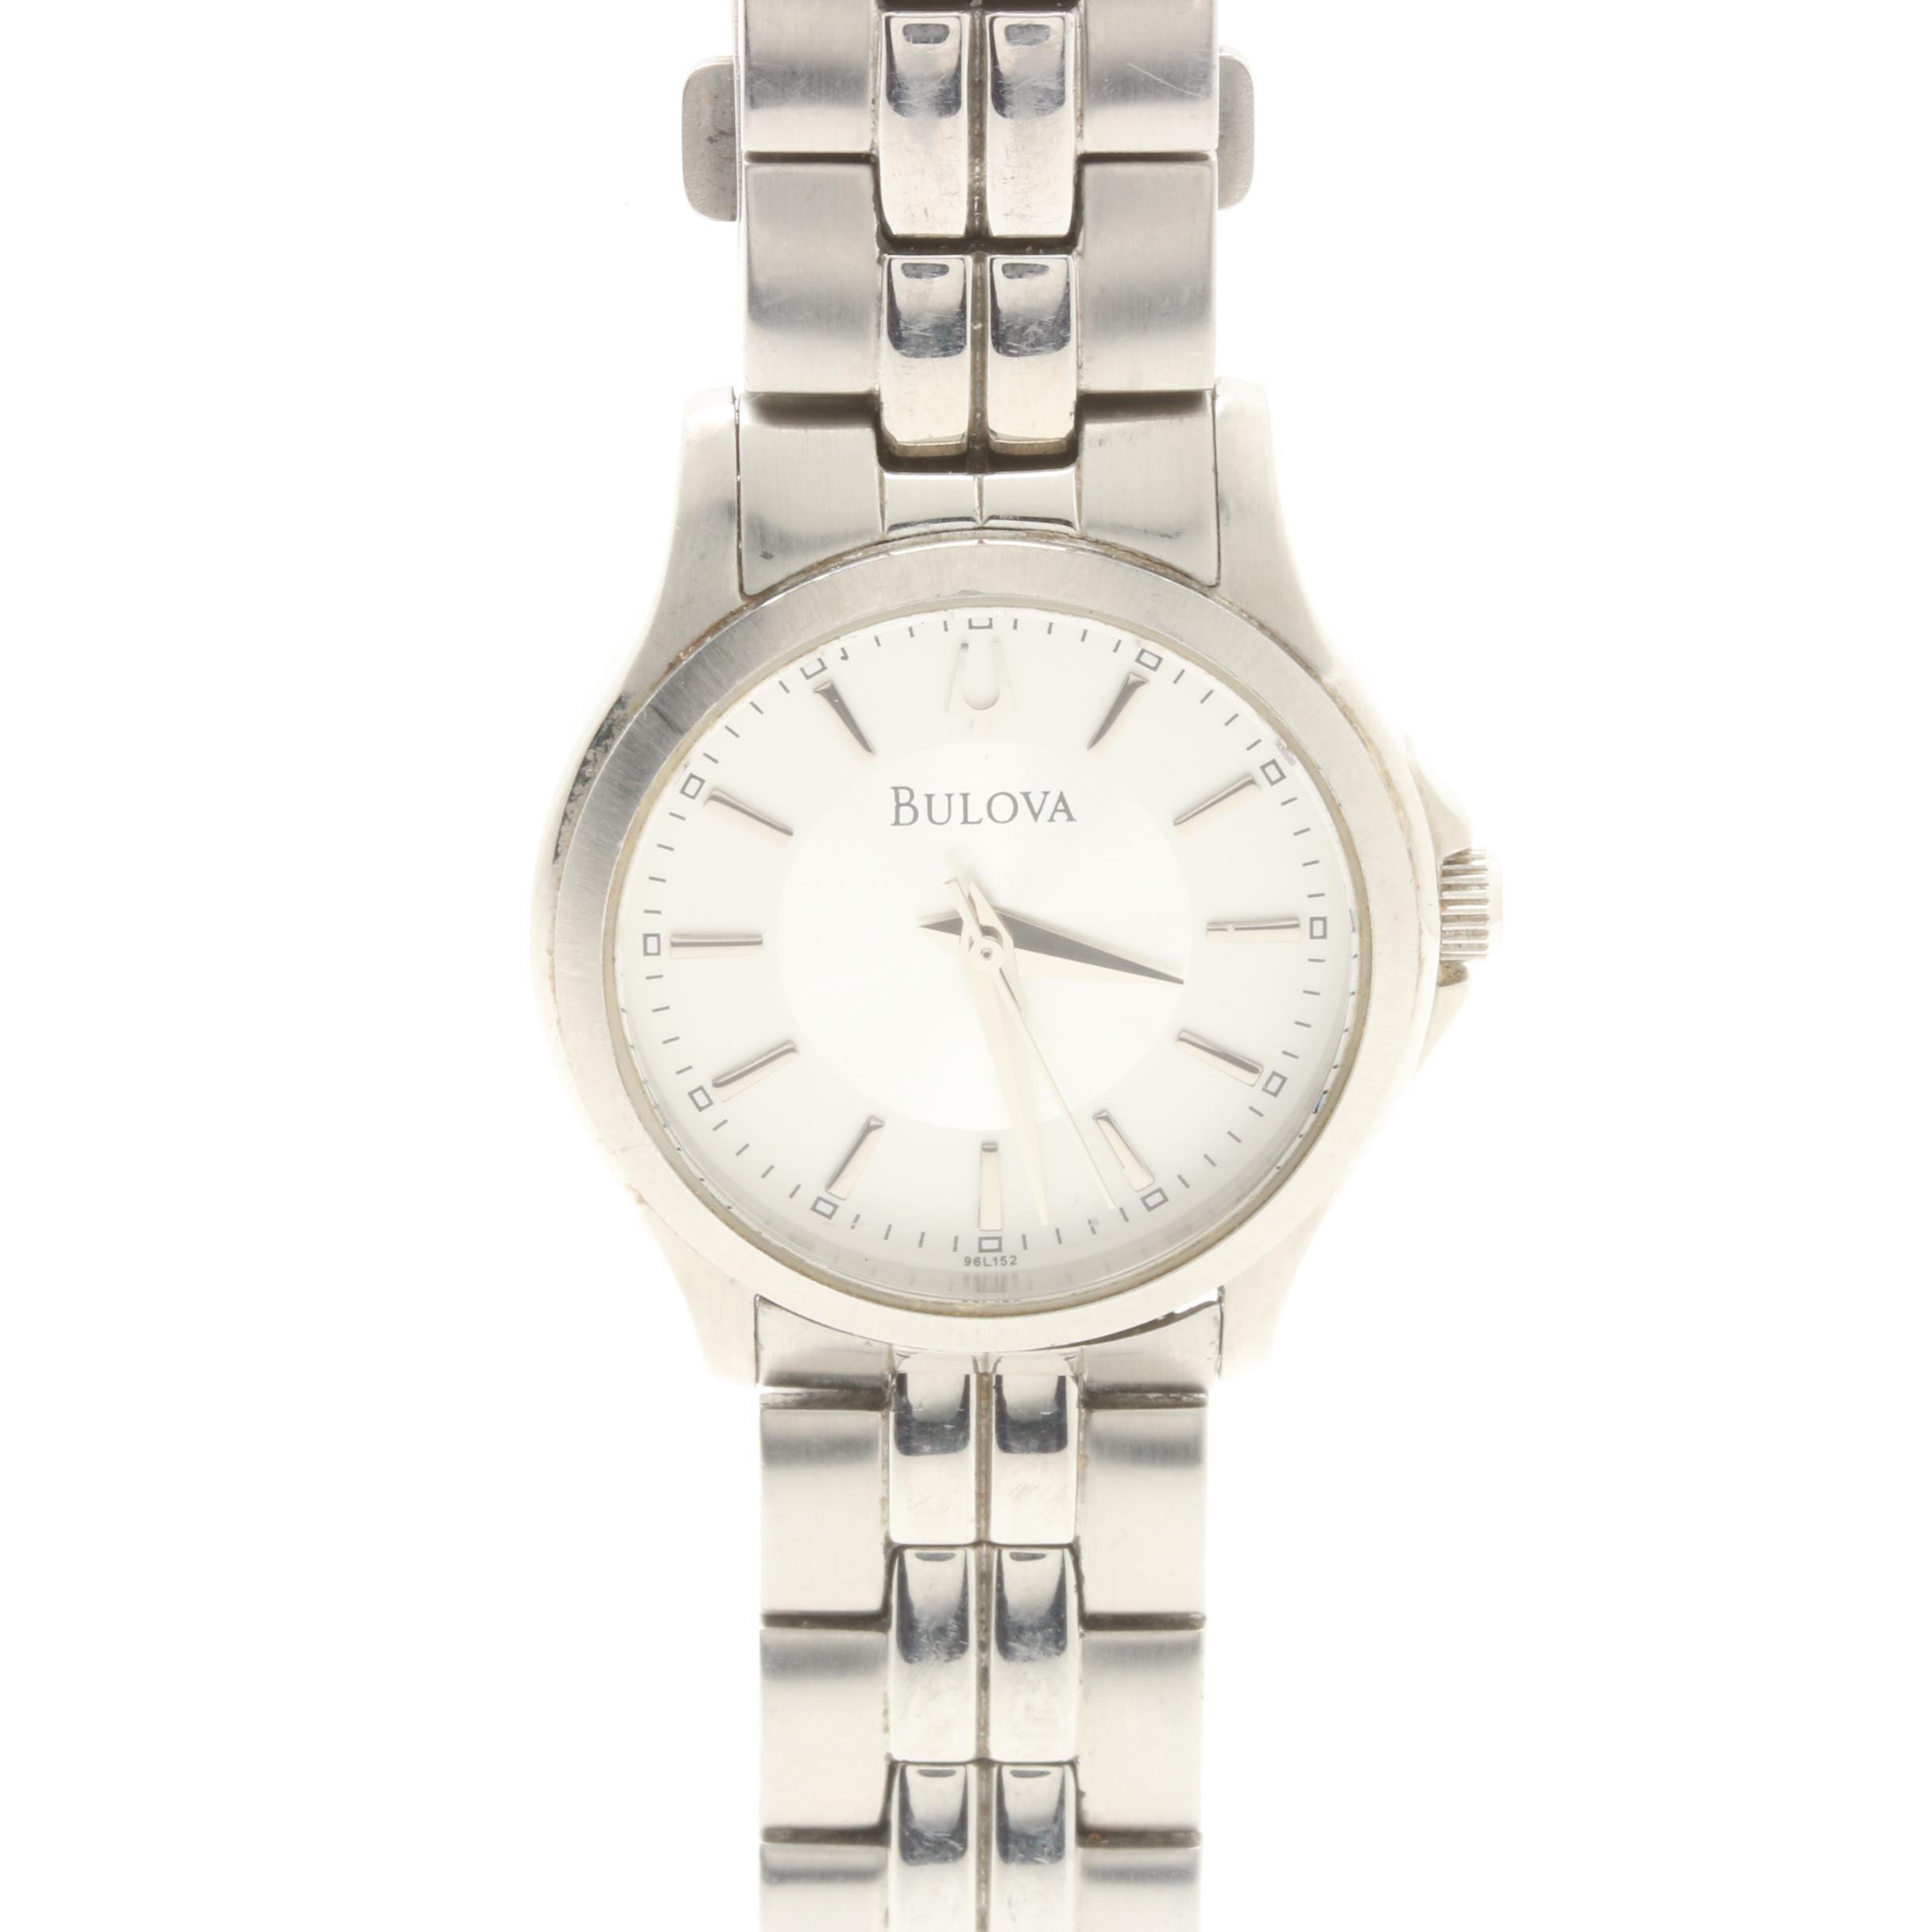 Bulova Silver-Tone Wristwatch